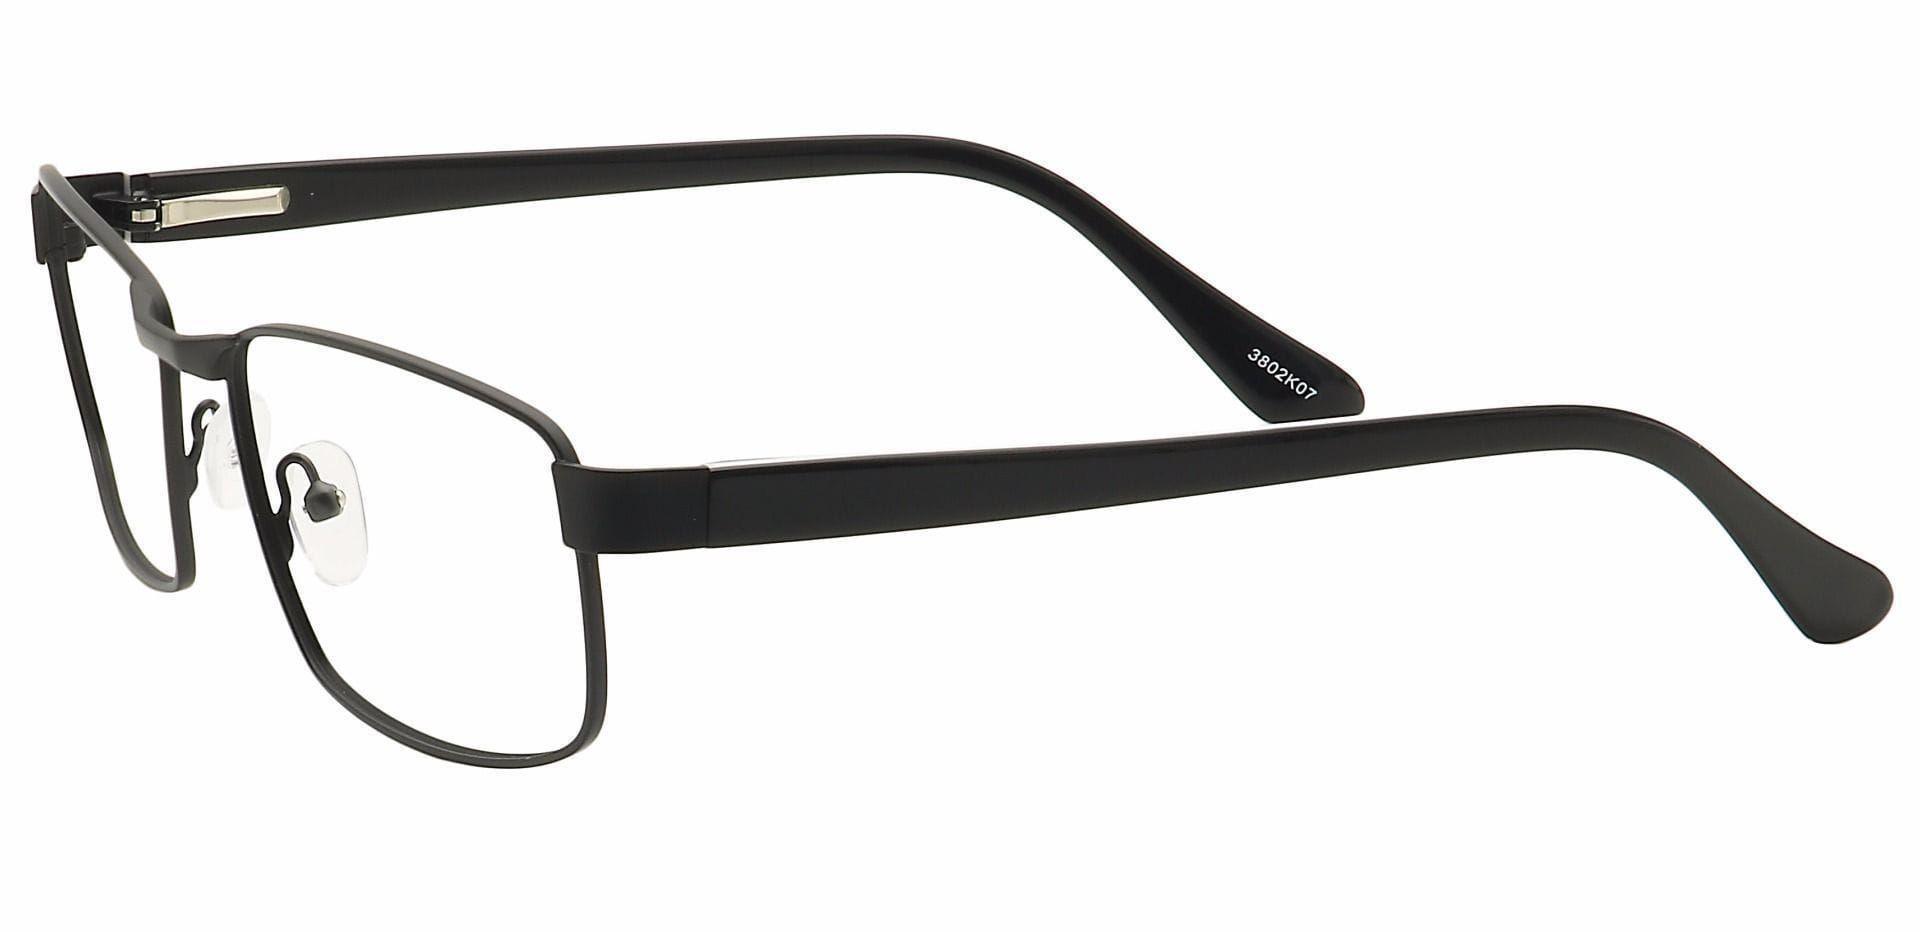 Lewis Rectangle Eyeglasses Frame - Black